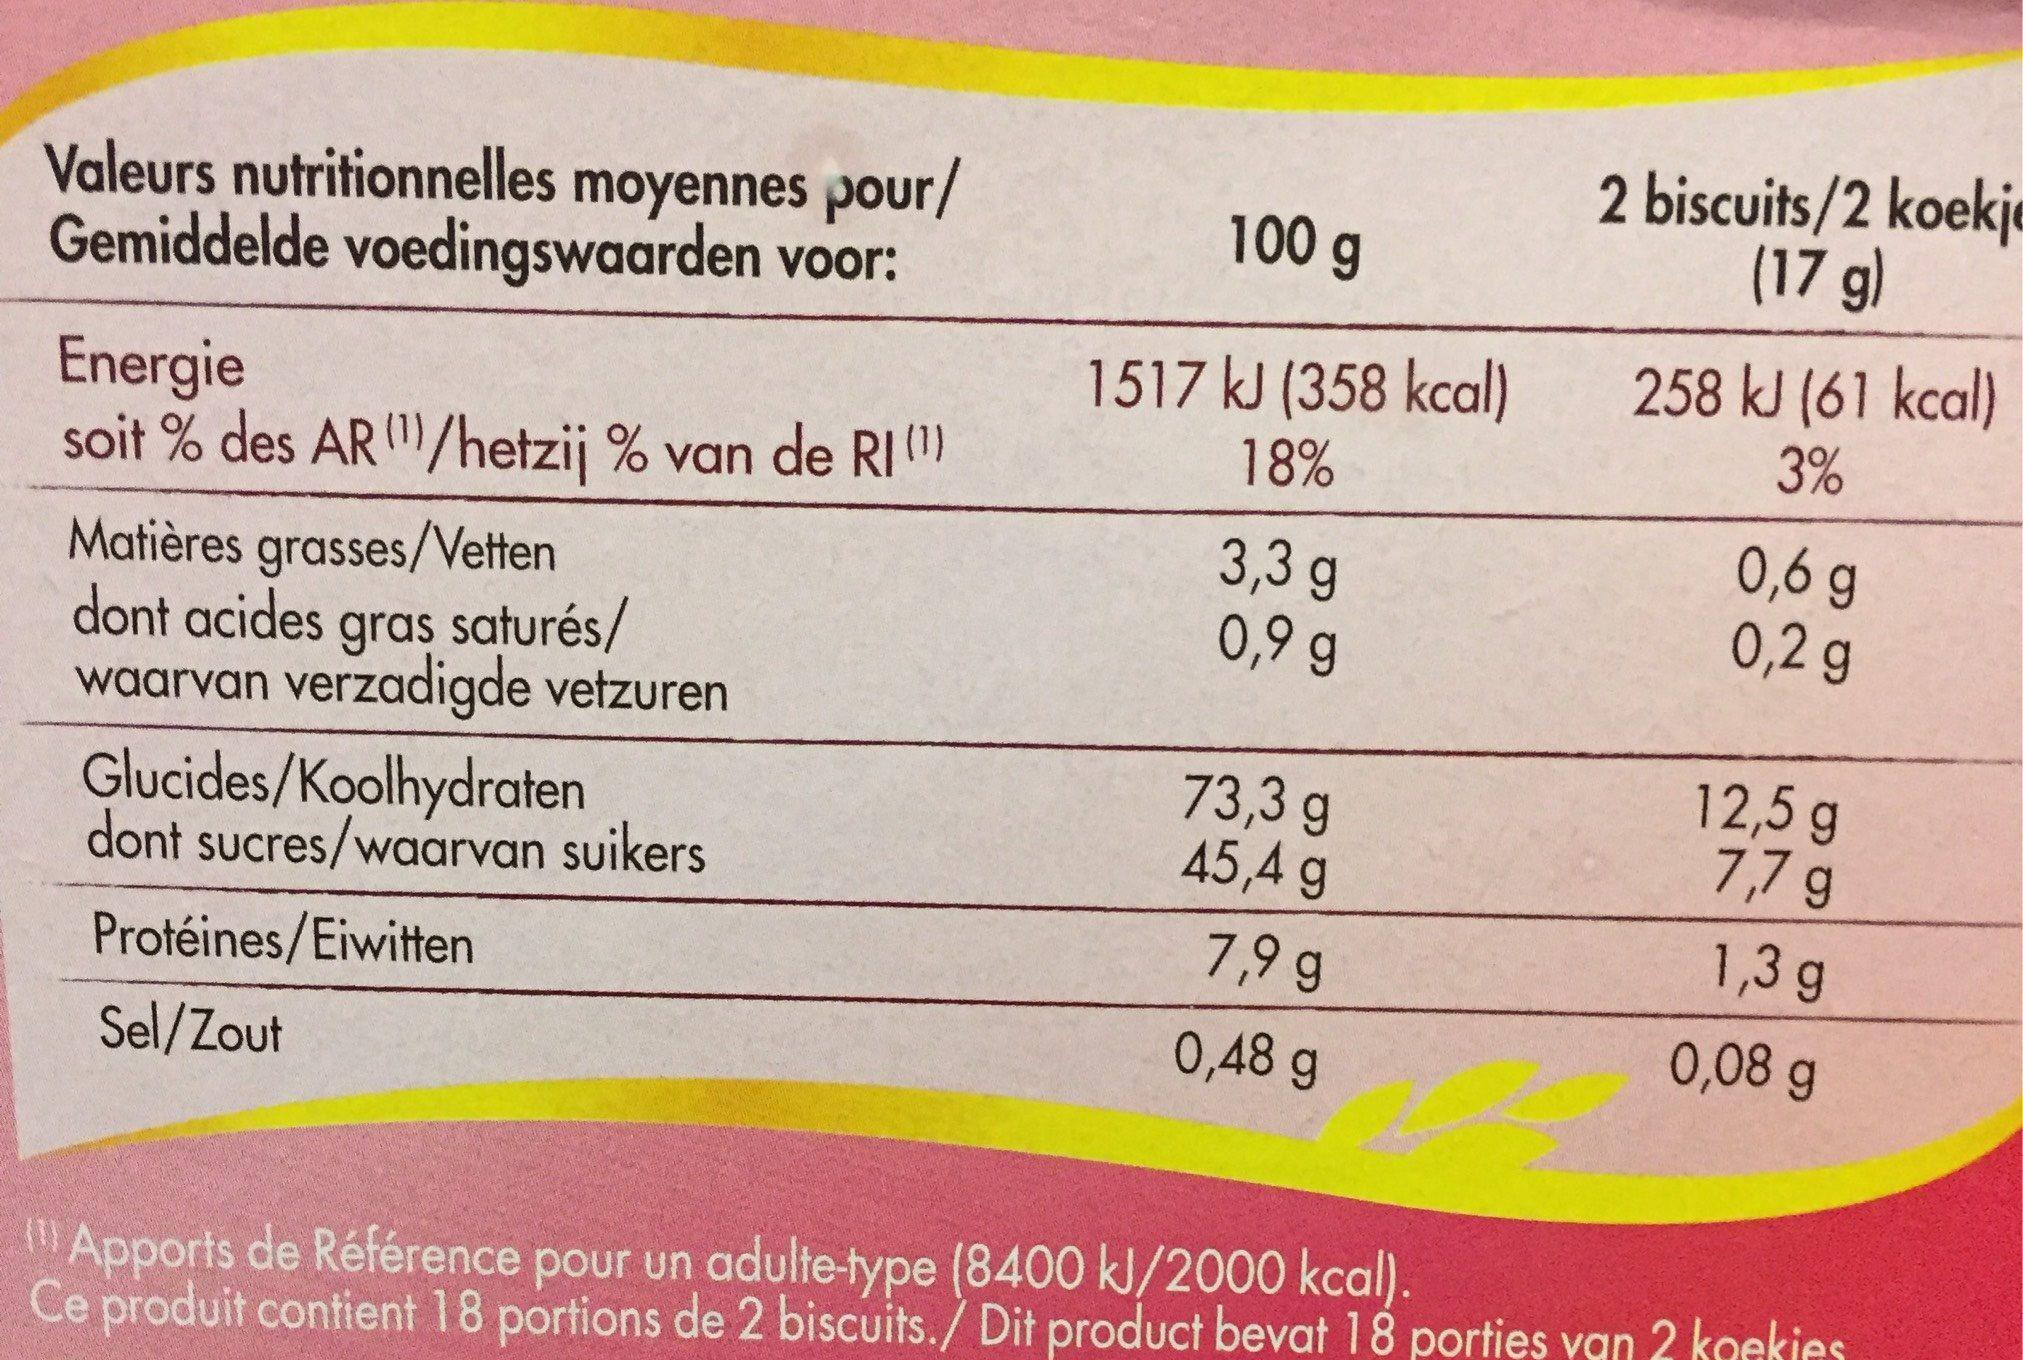 Biscuits cuillers aux oeufs frais - Nutrition facts - fr